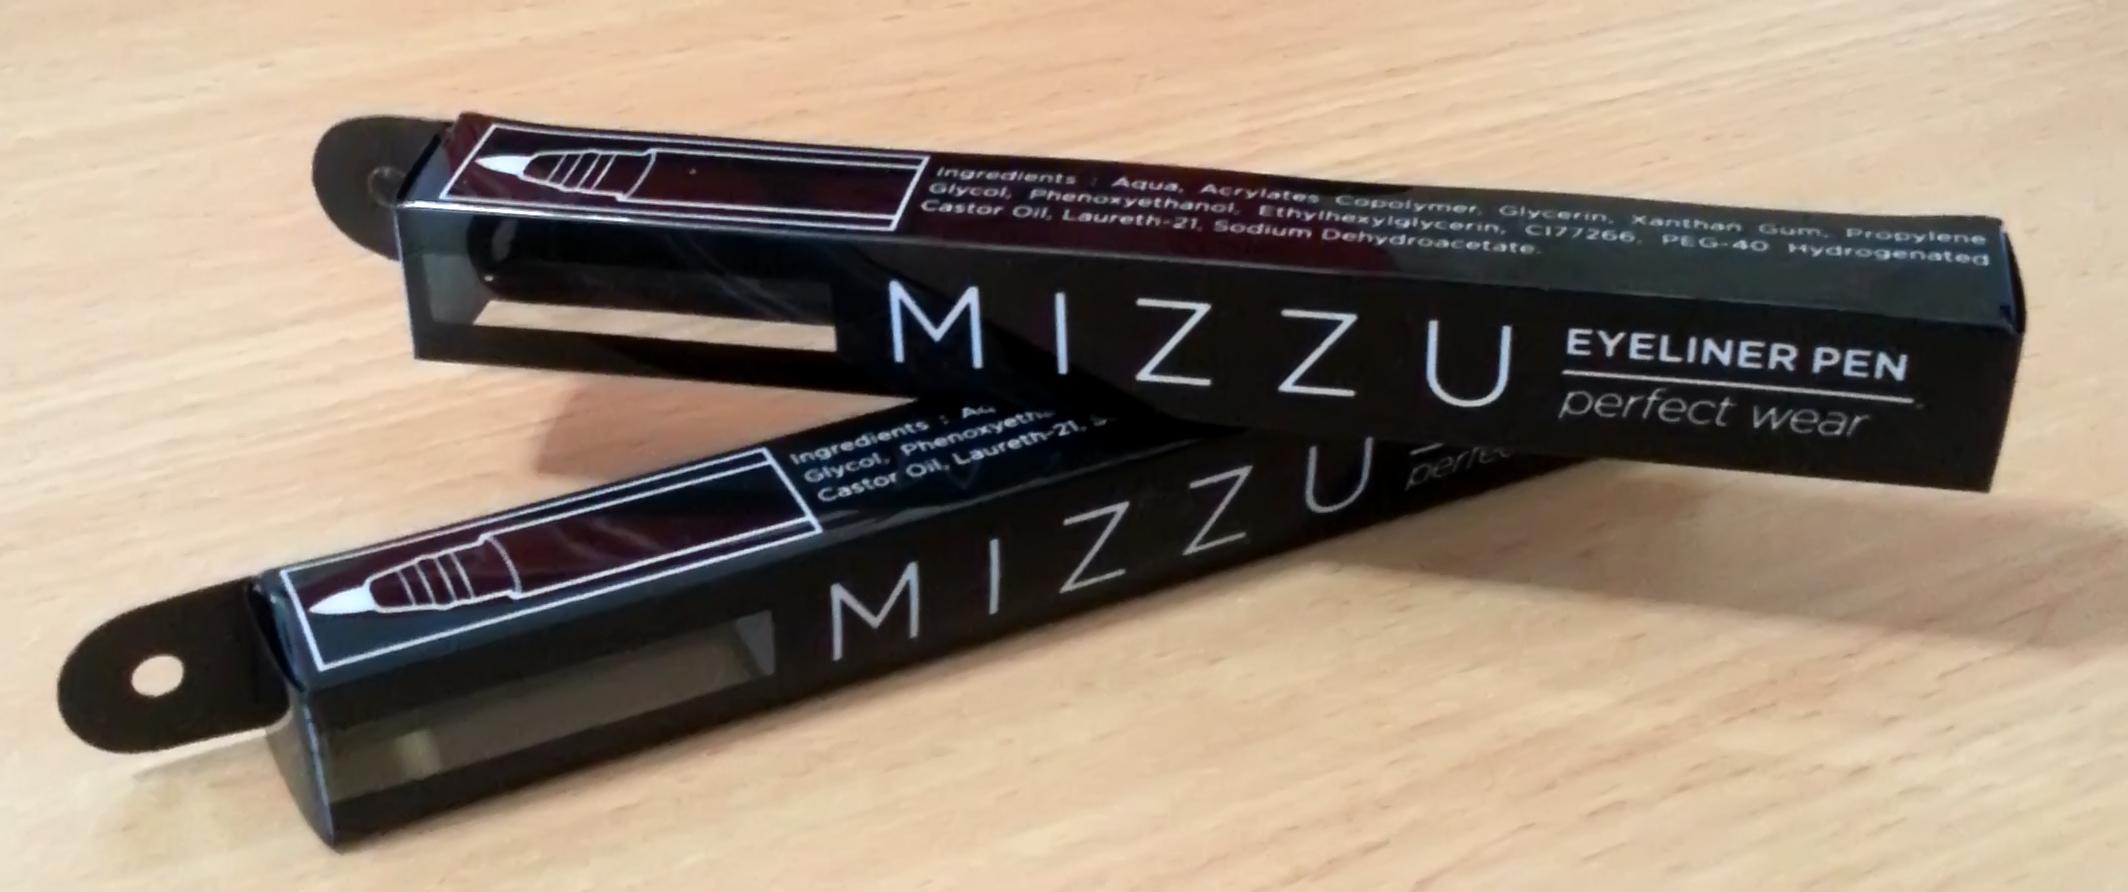 Mica Mizzu Eyeliner